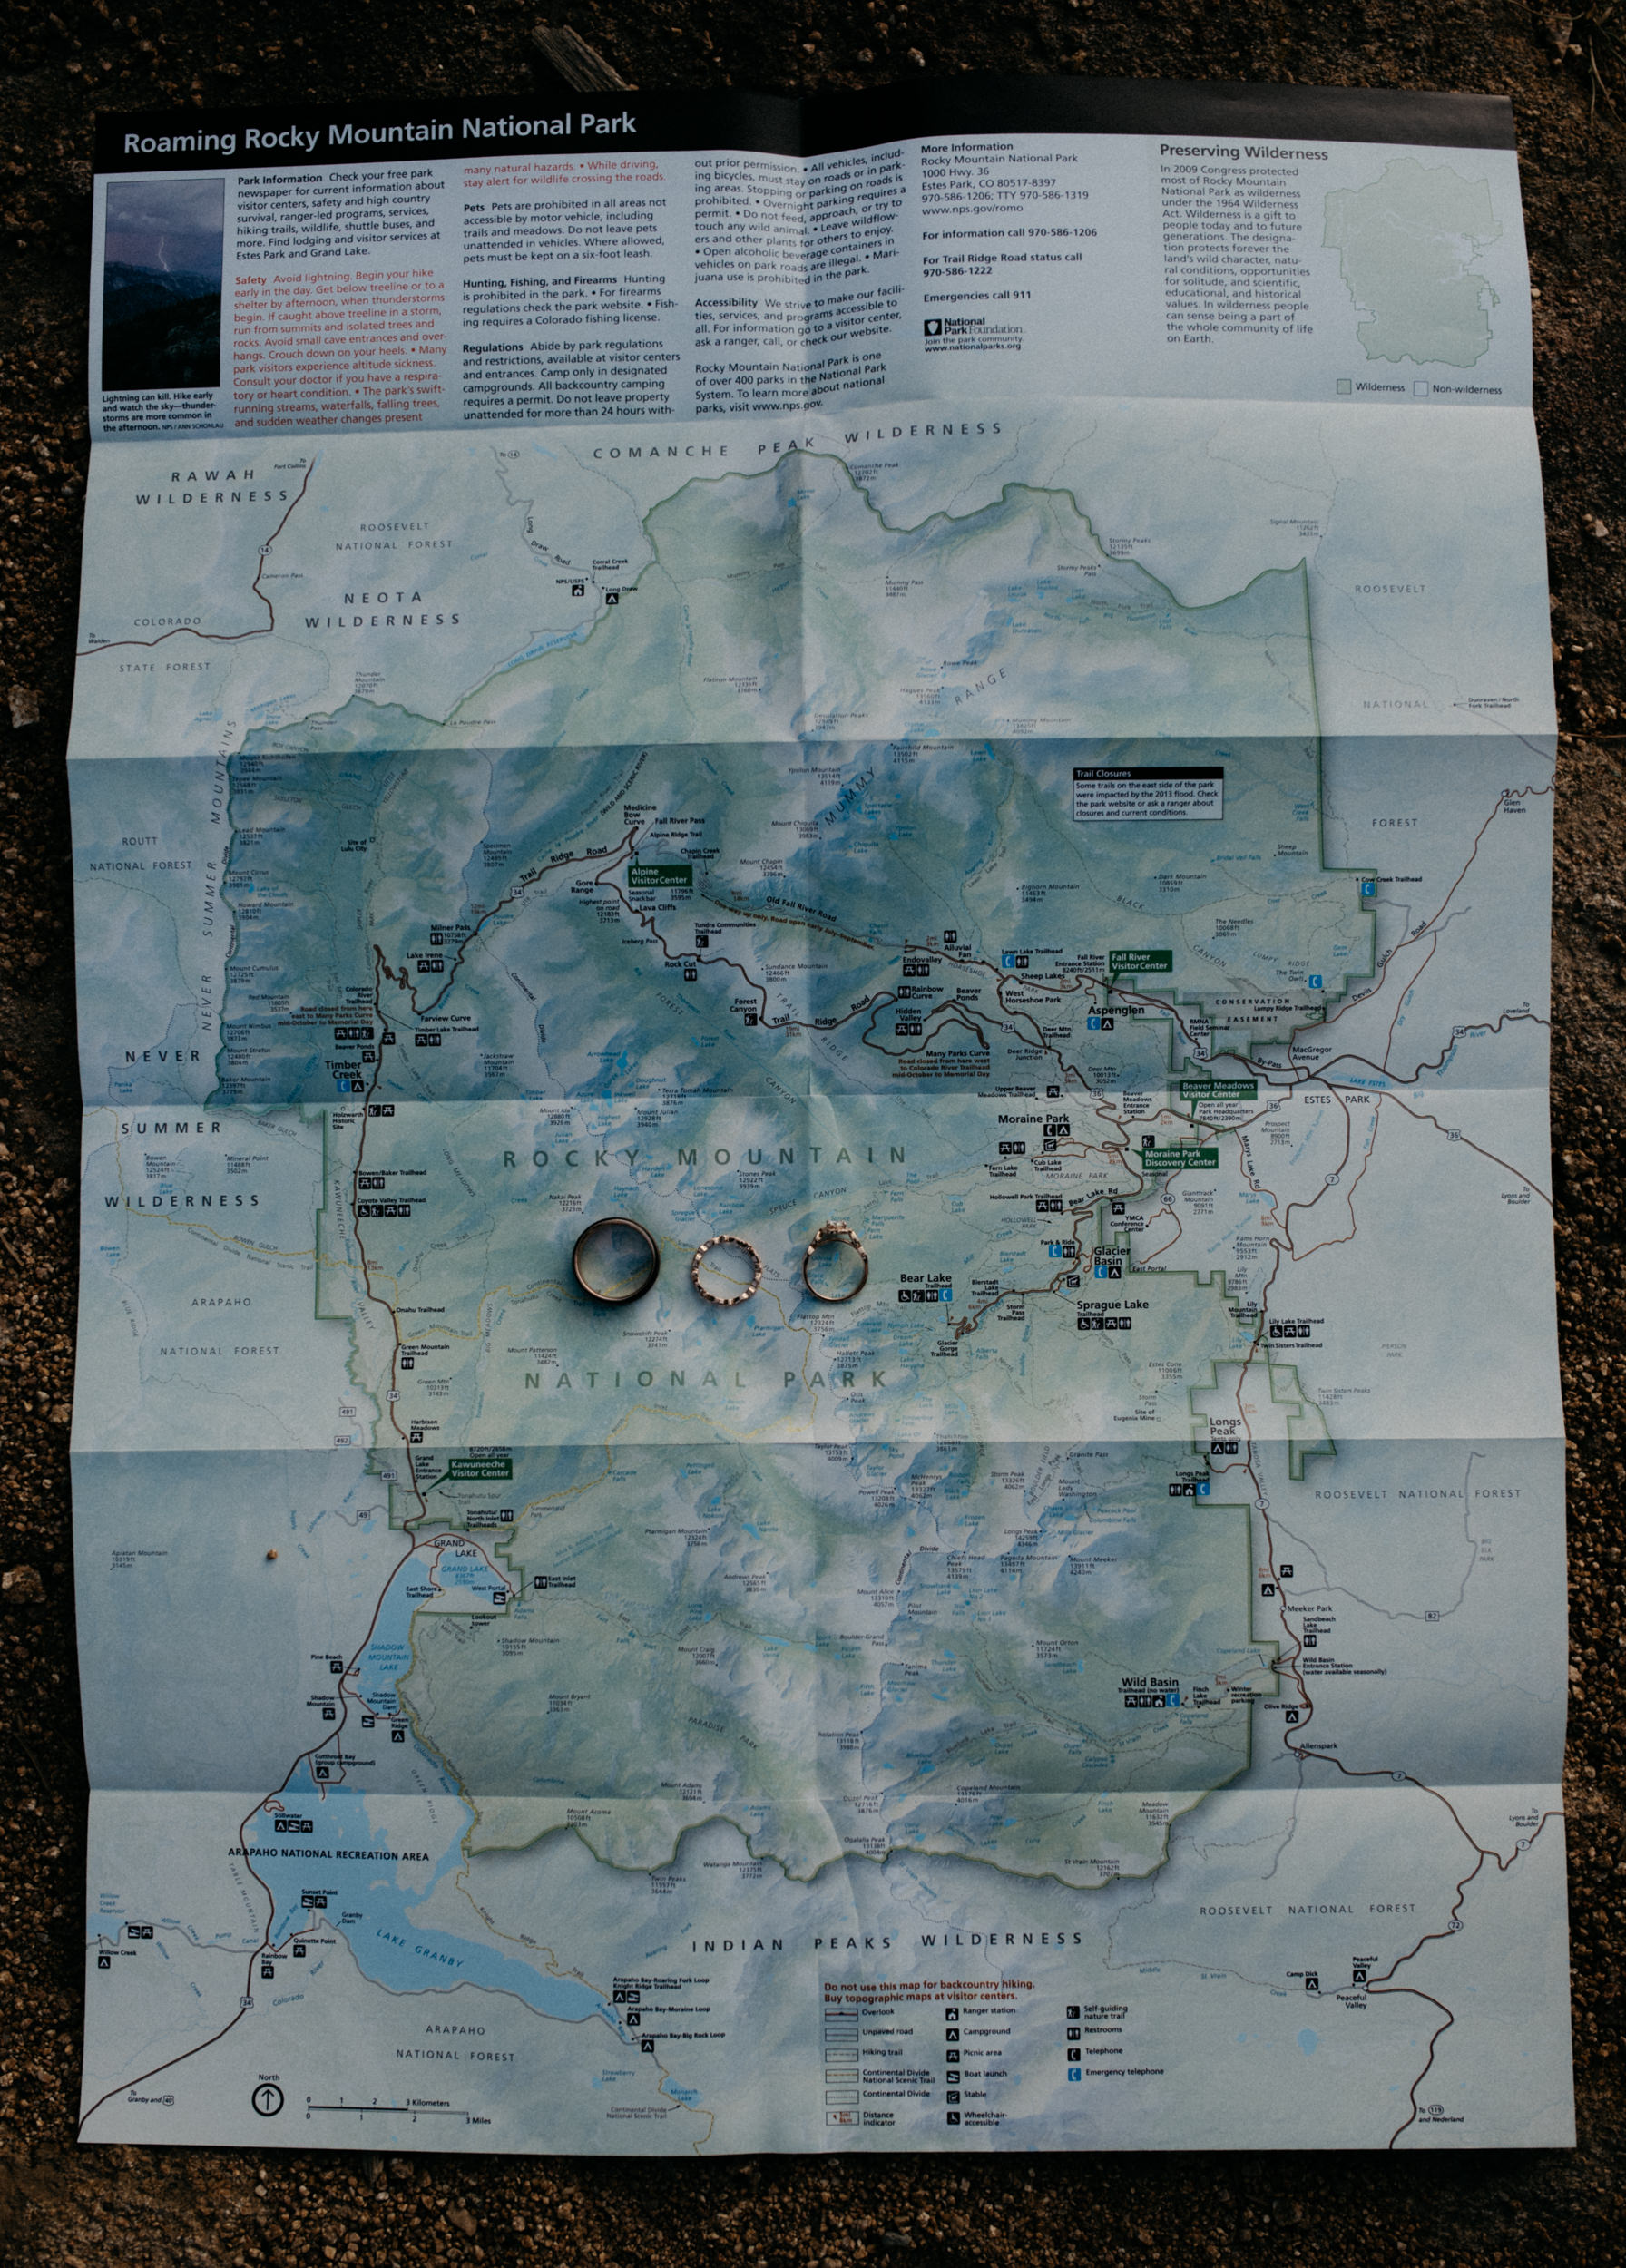 Rocky Mountain National Park adventure elopement inspiration in Colorado. Colorado elopement and wedding photographer.